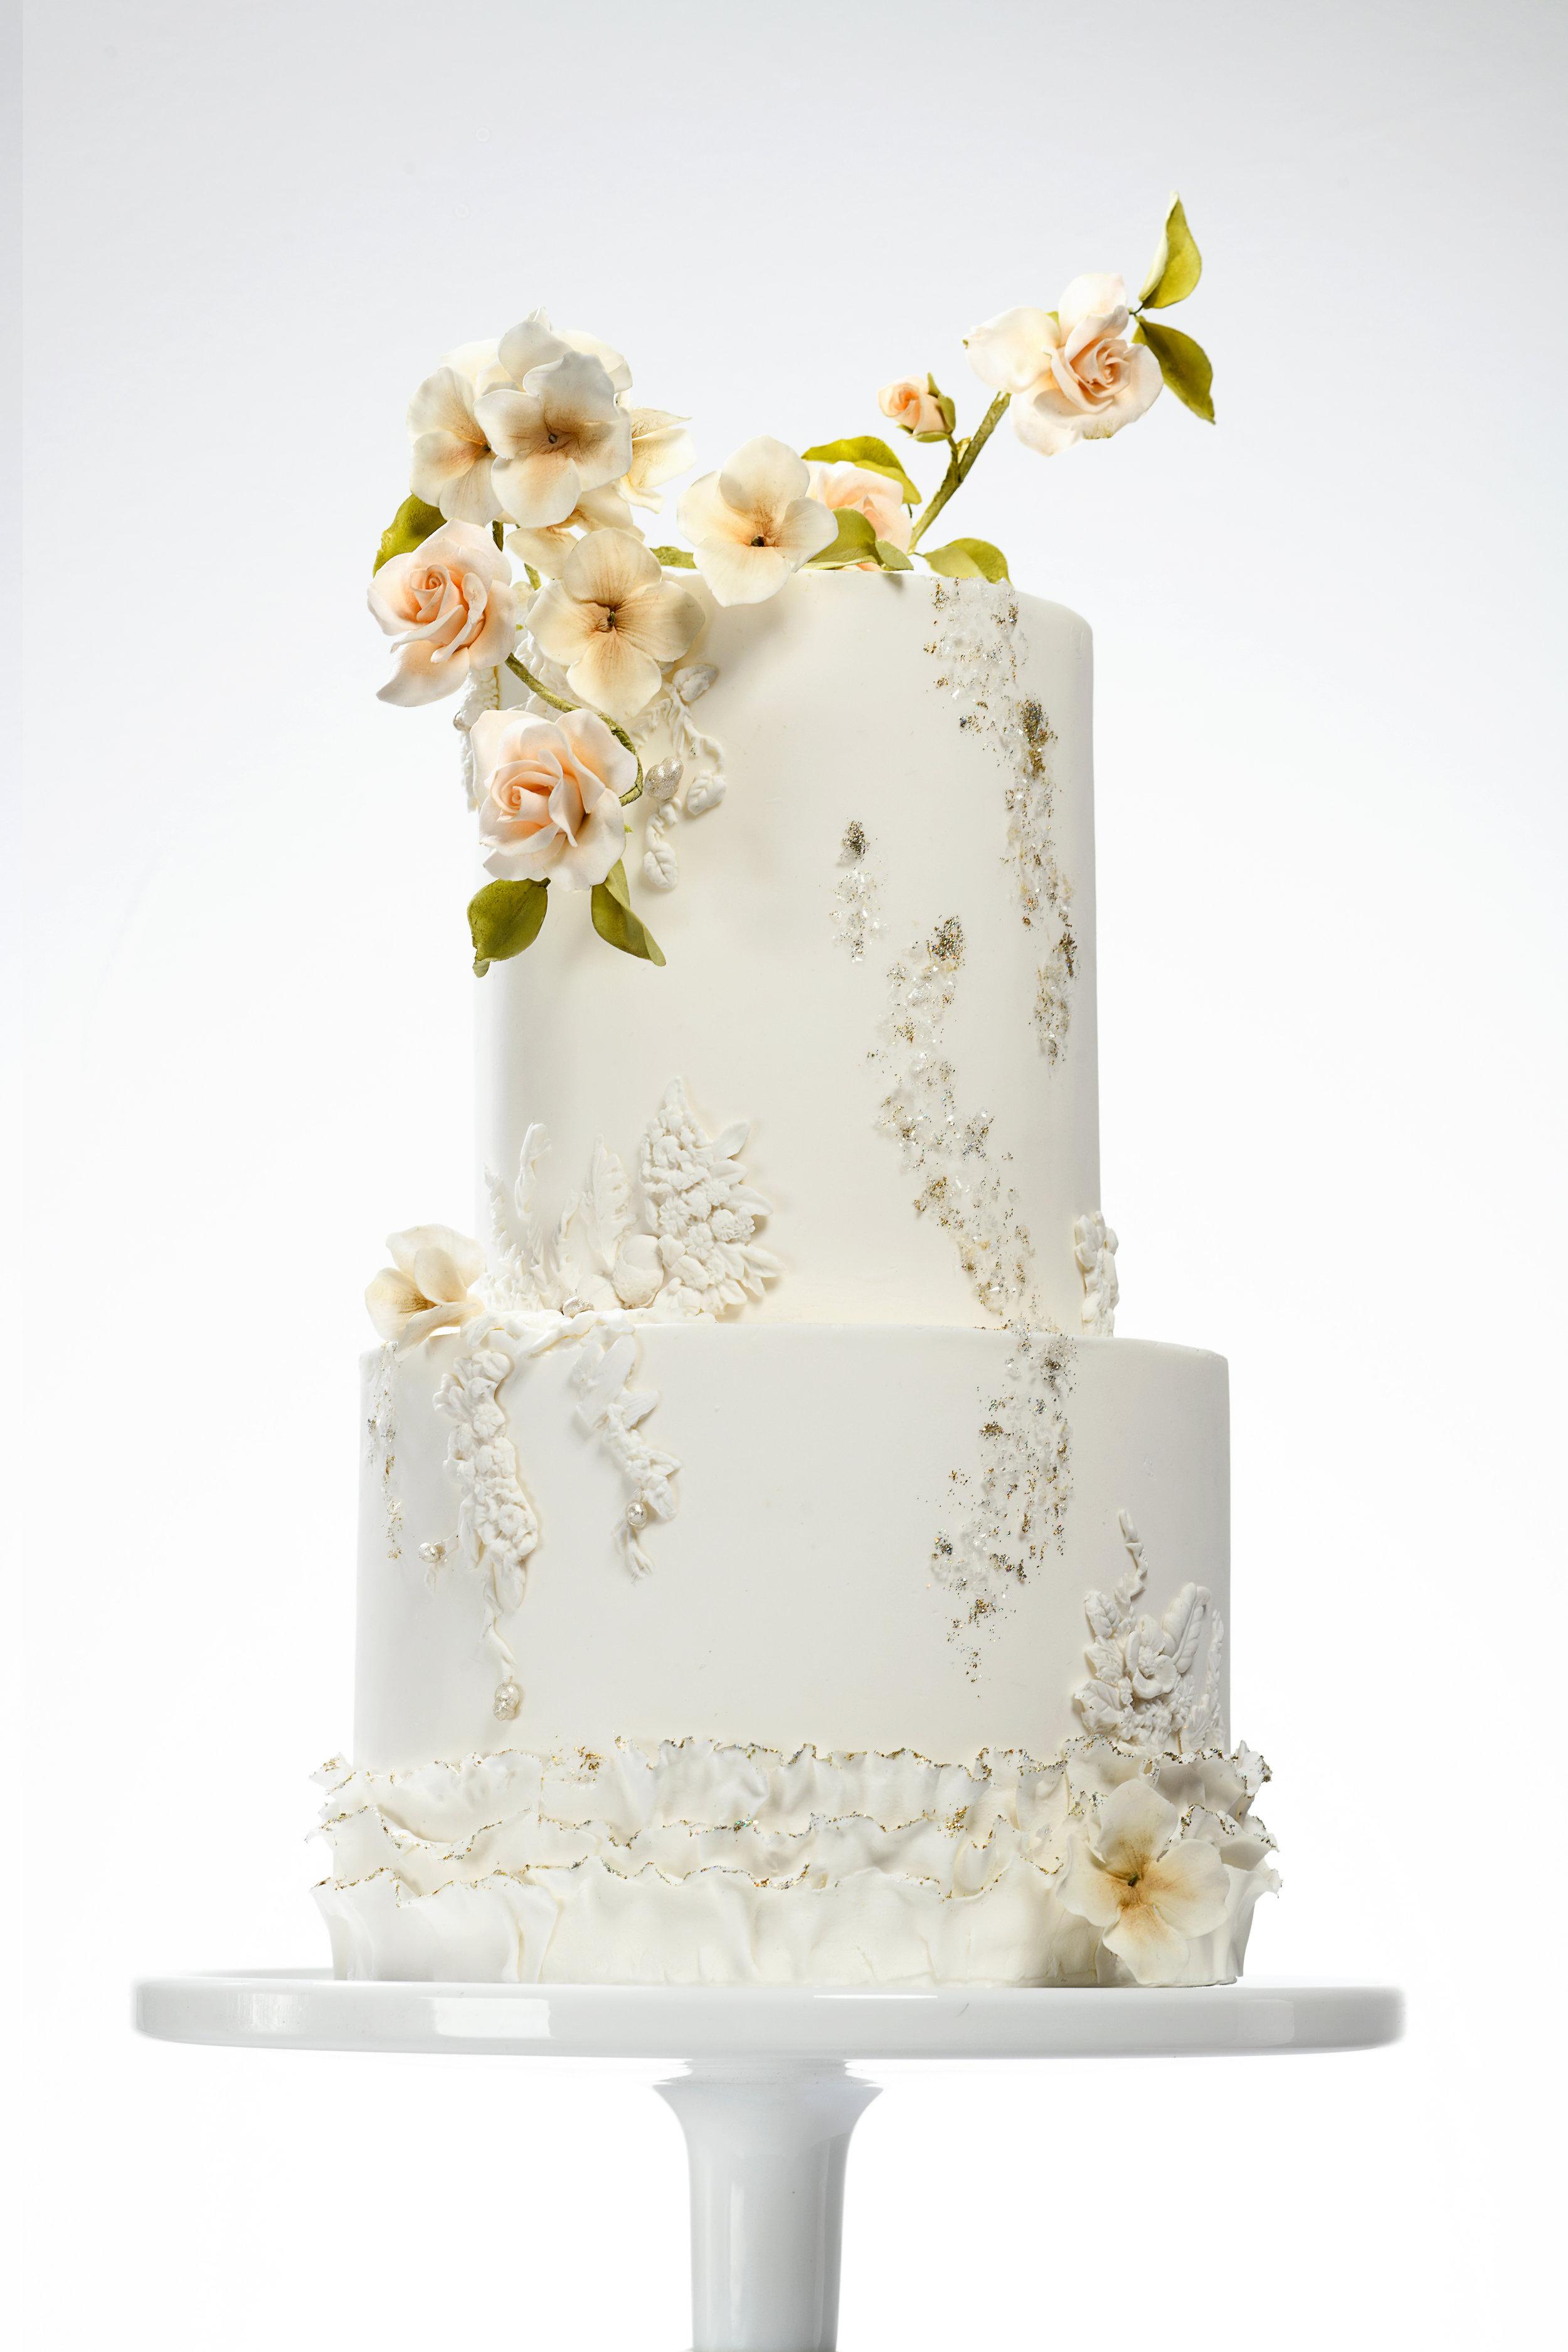 Photo: Courtesy of The Cake Atelier by Poushy | Instagram:  TheCakeAtelierByPoushy  | Phone #:  01202222002